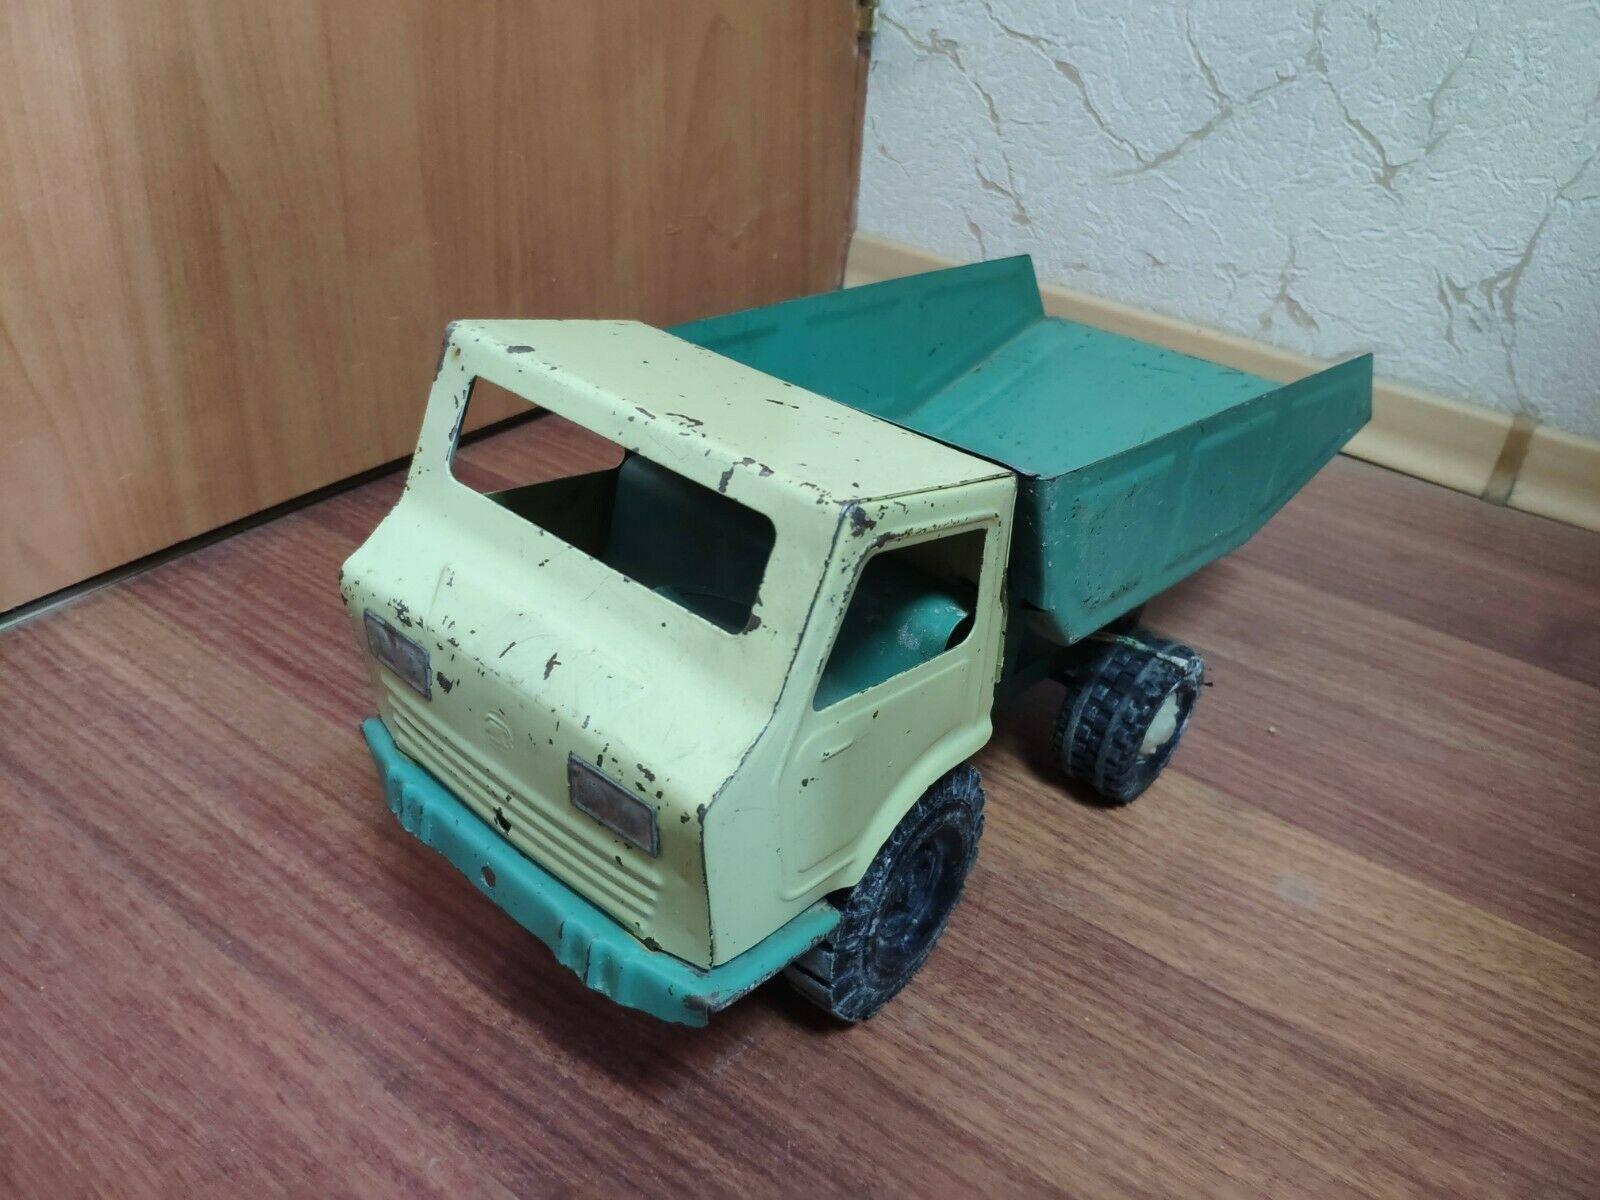 Vintage Raros temprano década de 1960 ruso URSS Soviética Estaño Juguete Coche Camión de juguete de metal